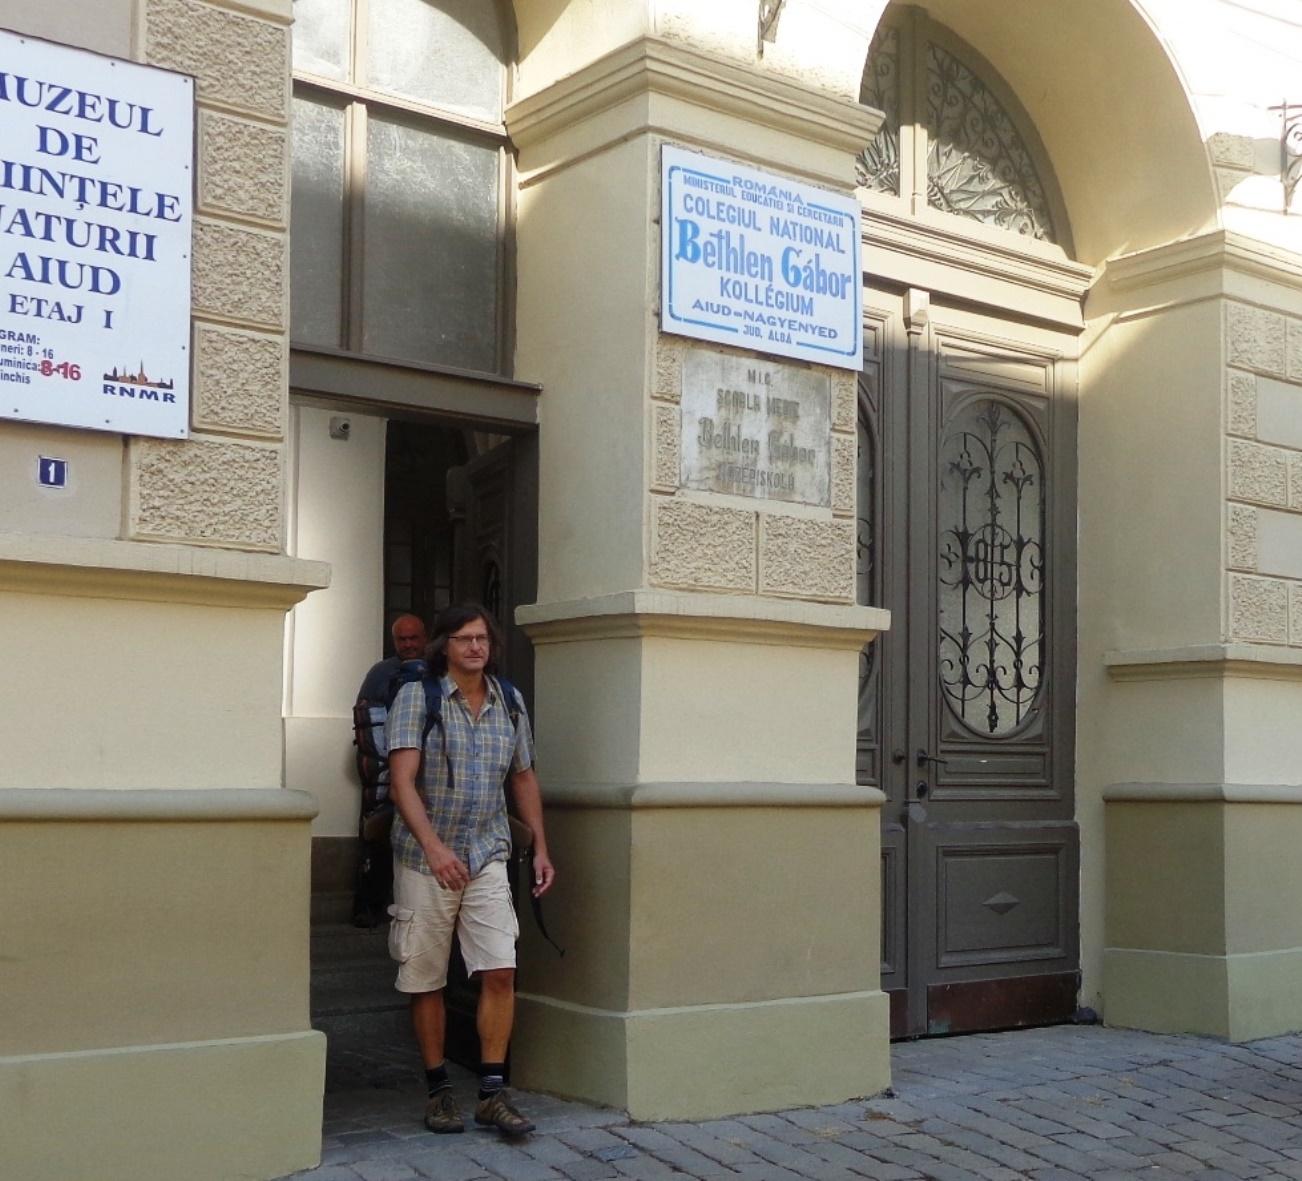 Gábor Bethlen College